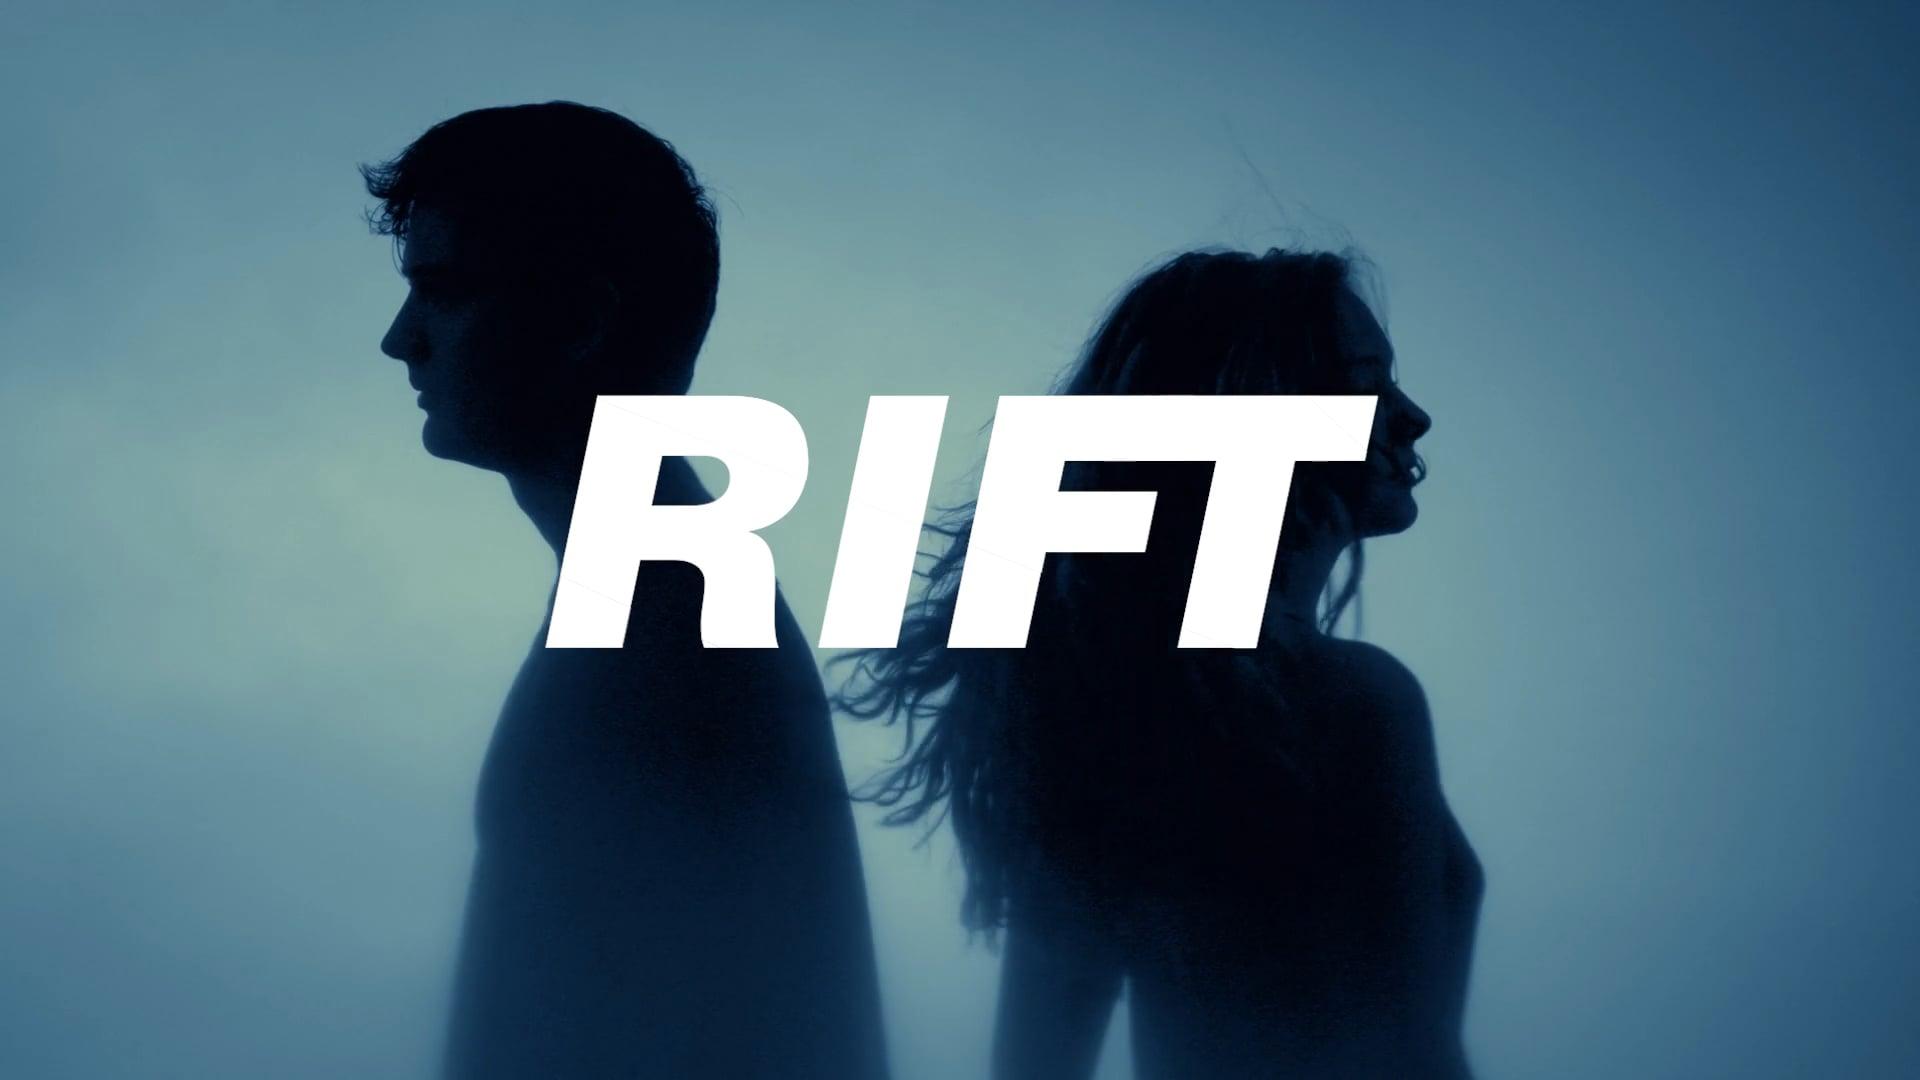 RIFT (Title Sequence) - Filmsupply Edit Fest